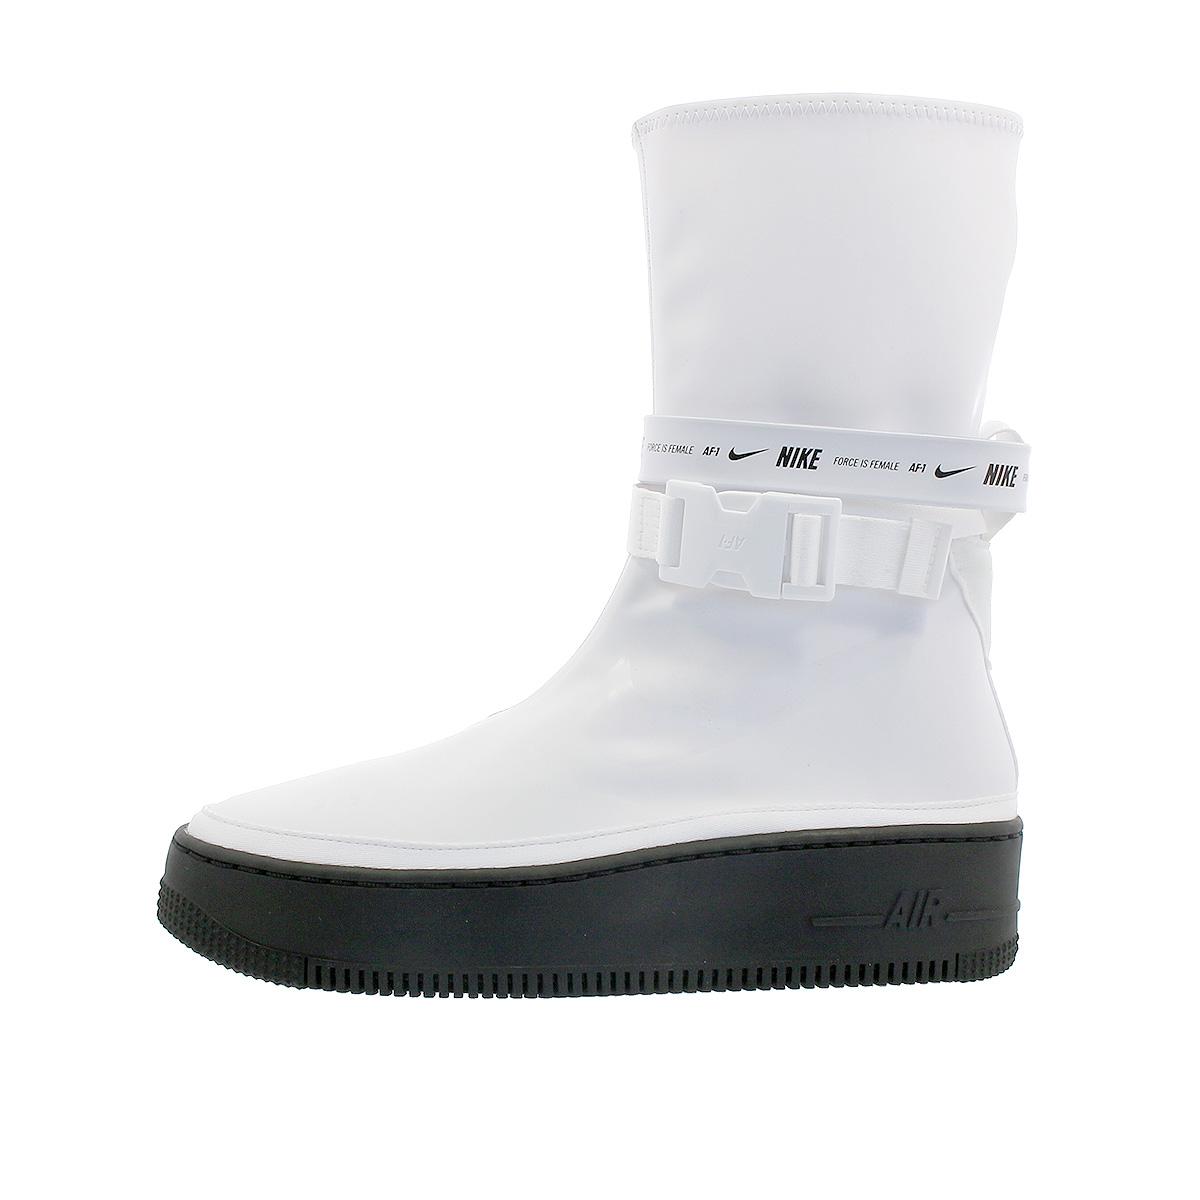 hot sales 004f4 ed646 NIKE WMNS AIR FORCE 1 SAGE HI XX Nike women air force 1 sage high XX  WHITE/BLACK